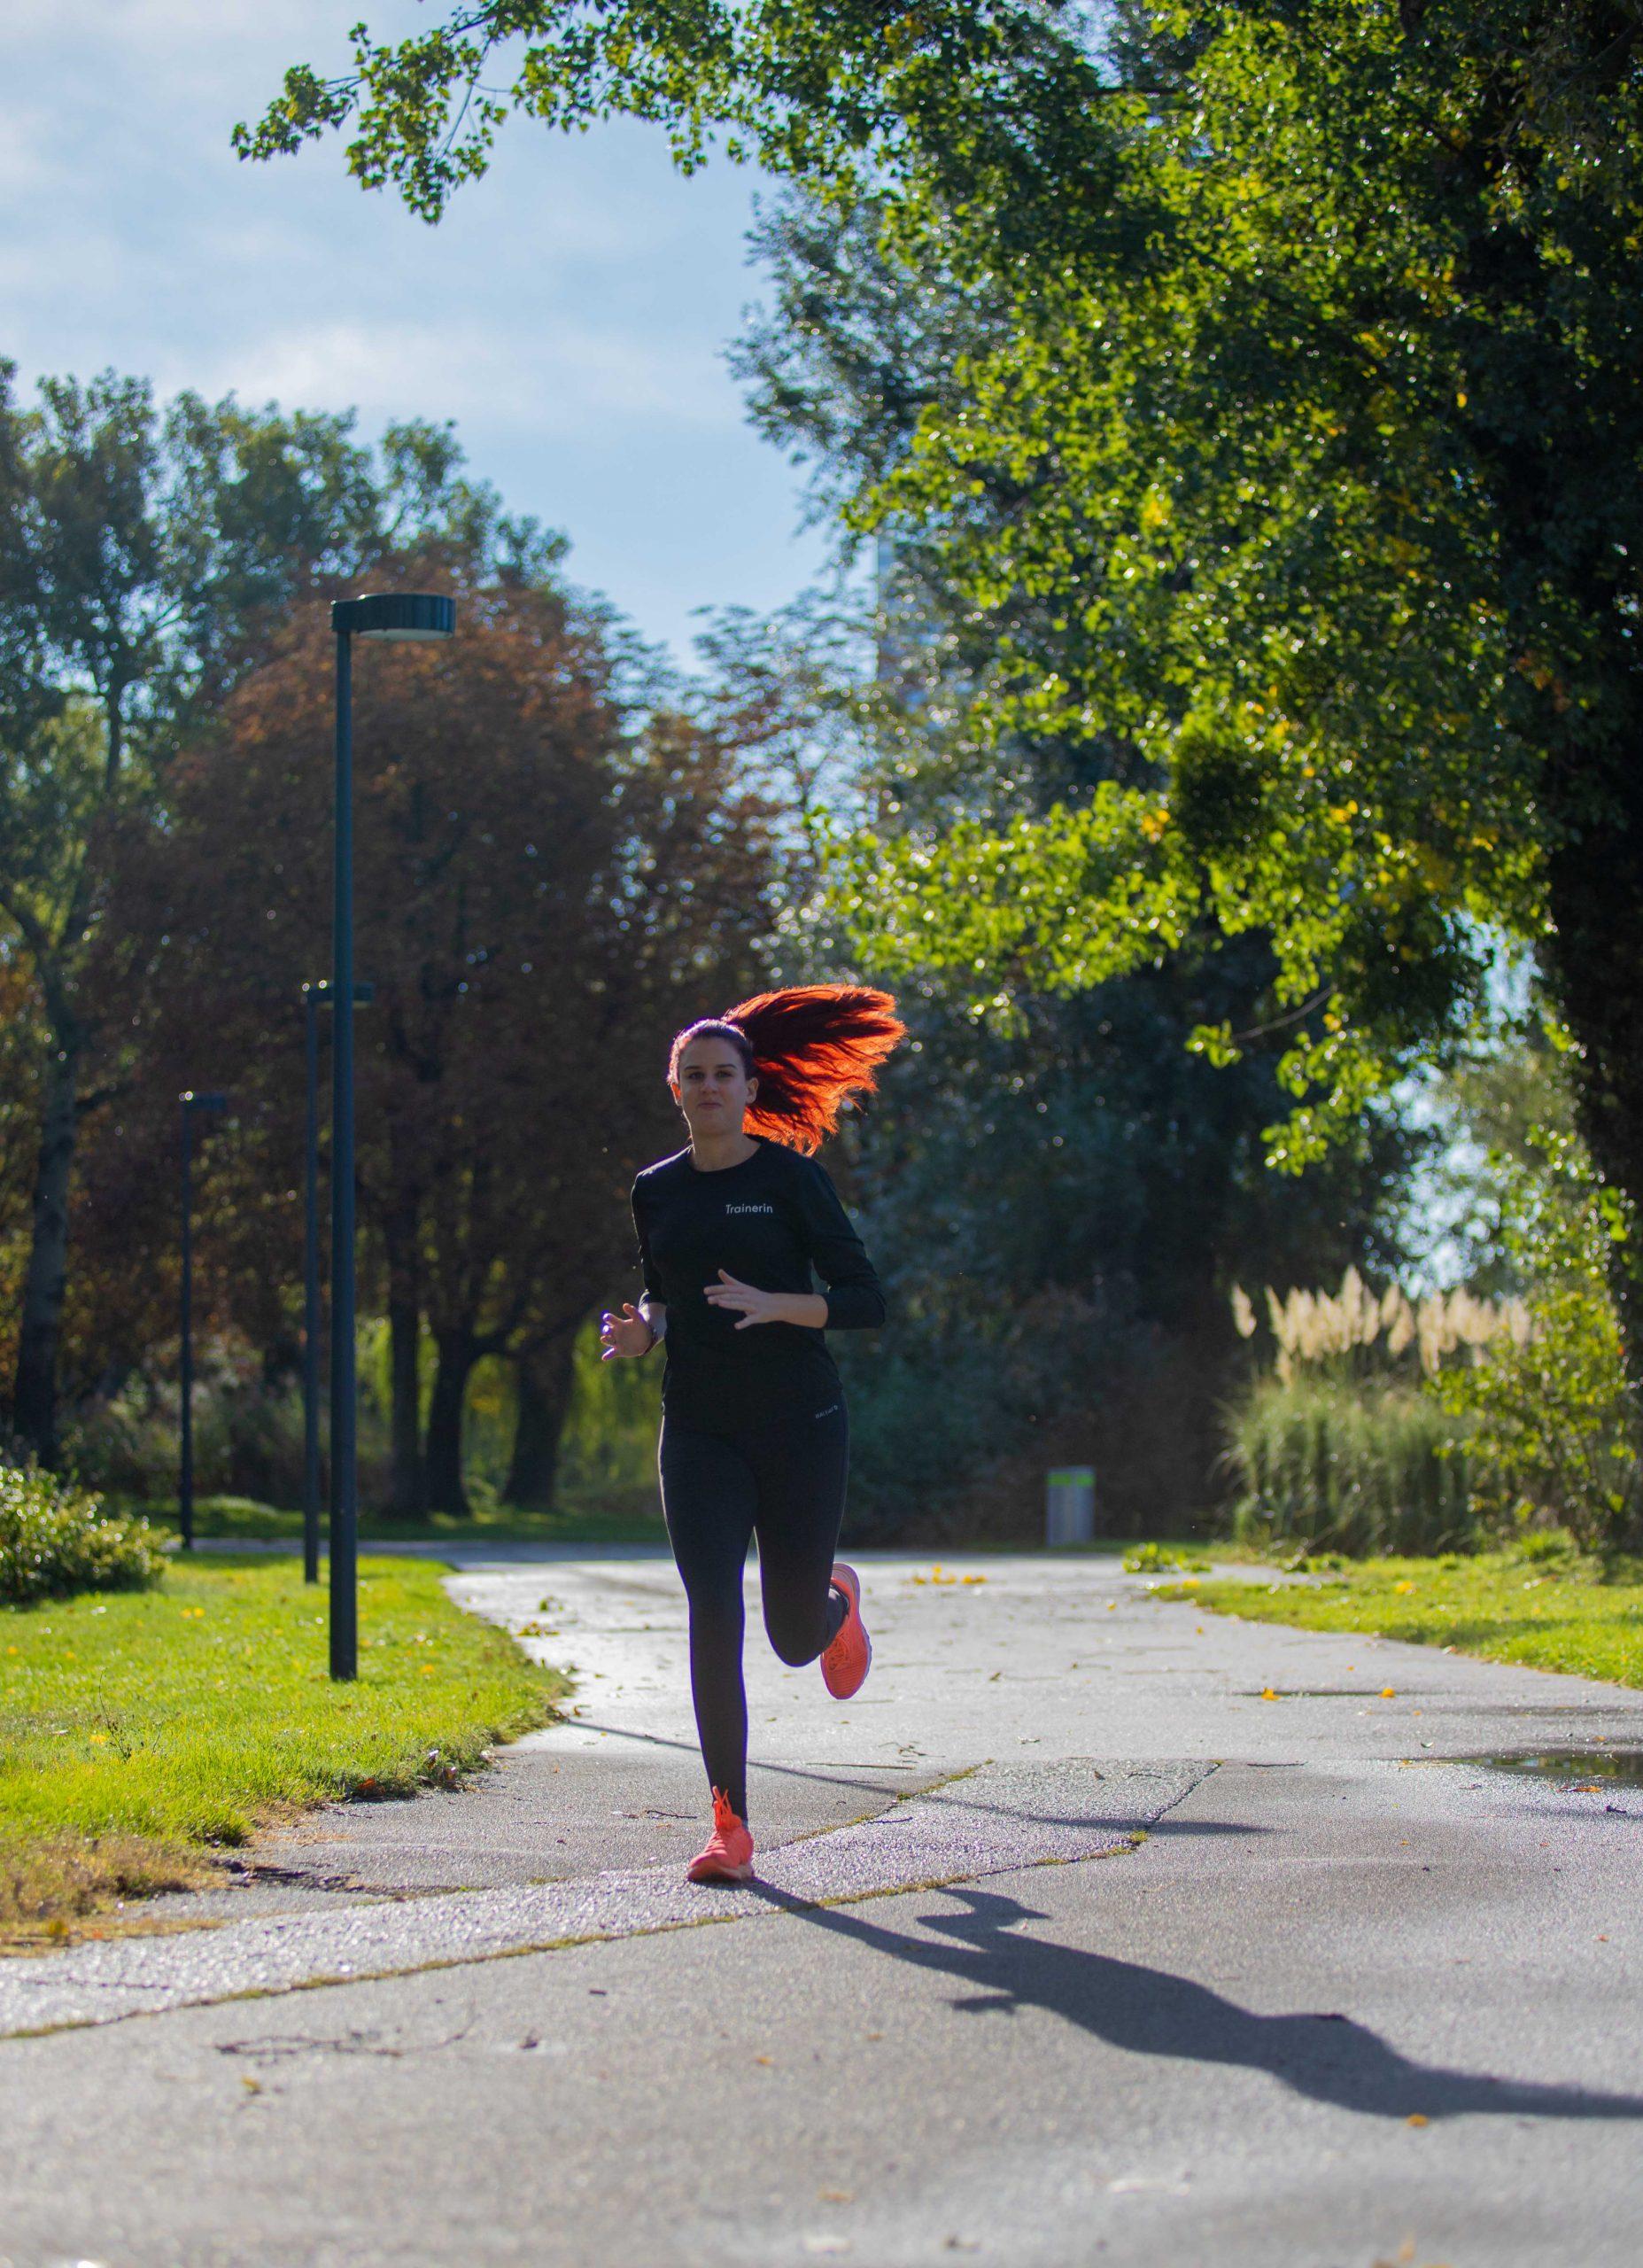 Läuferin läuft durch den Park